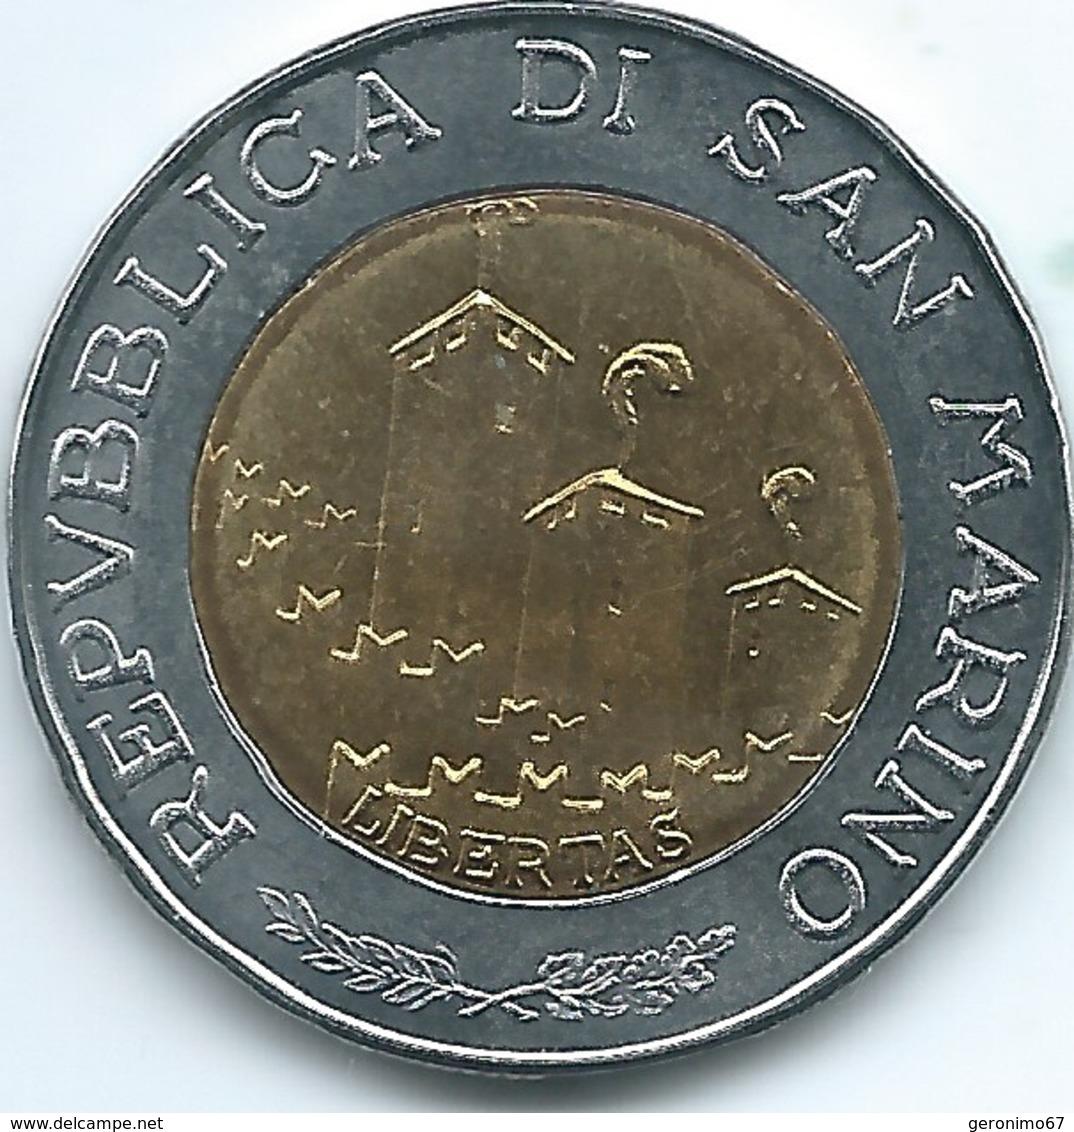 San Marino - 1993 - 500 Lire - KM301 - San Marino